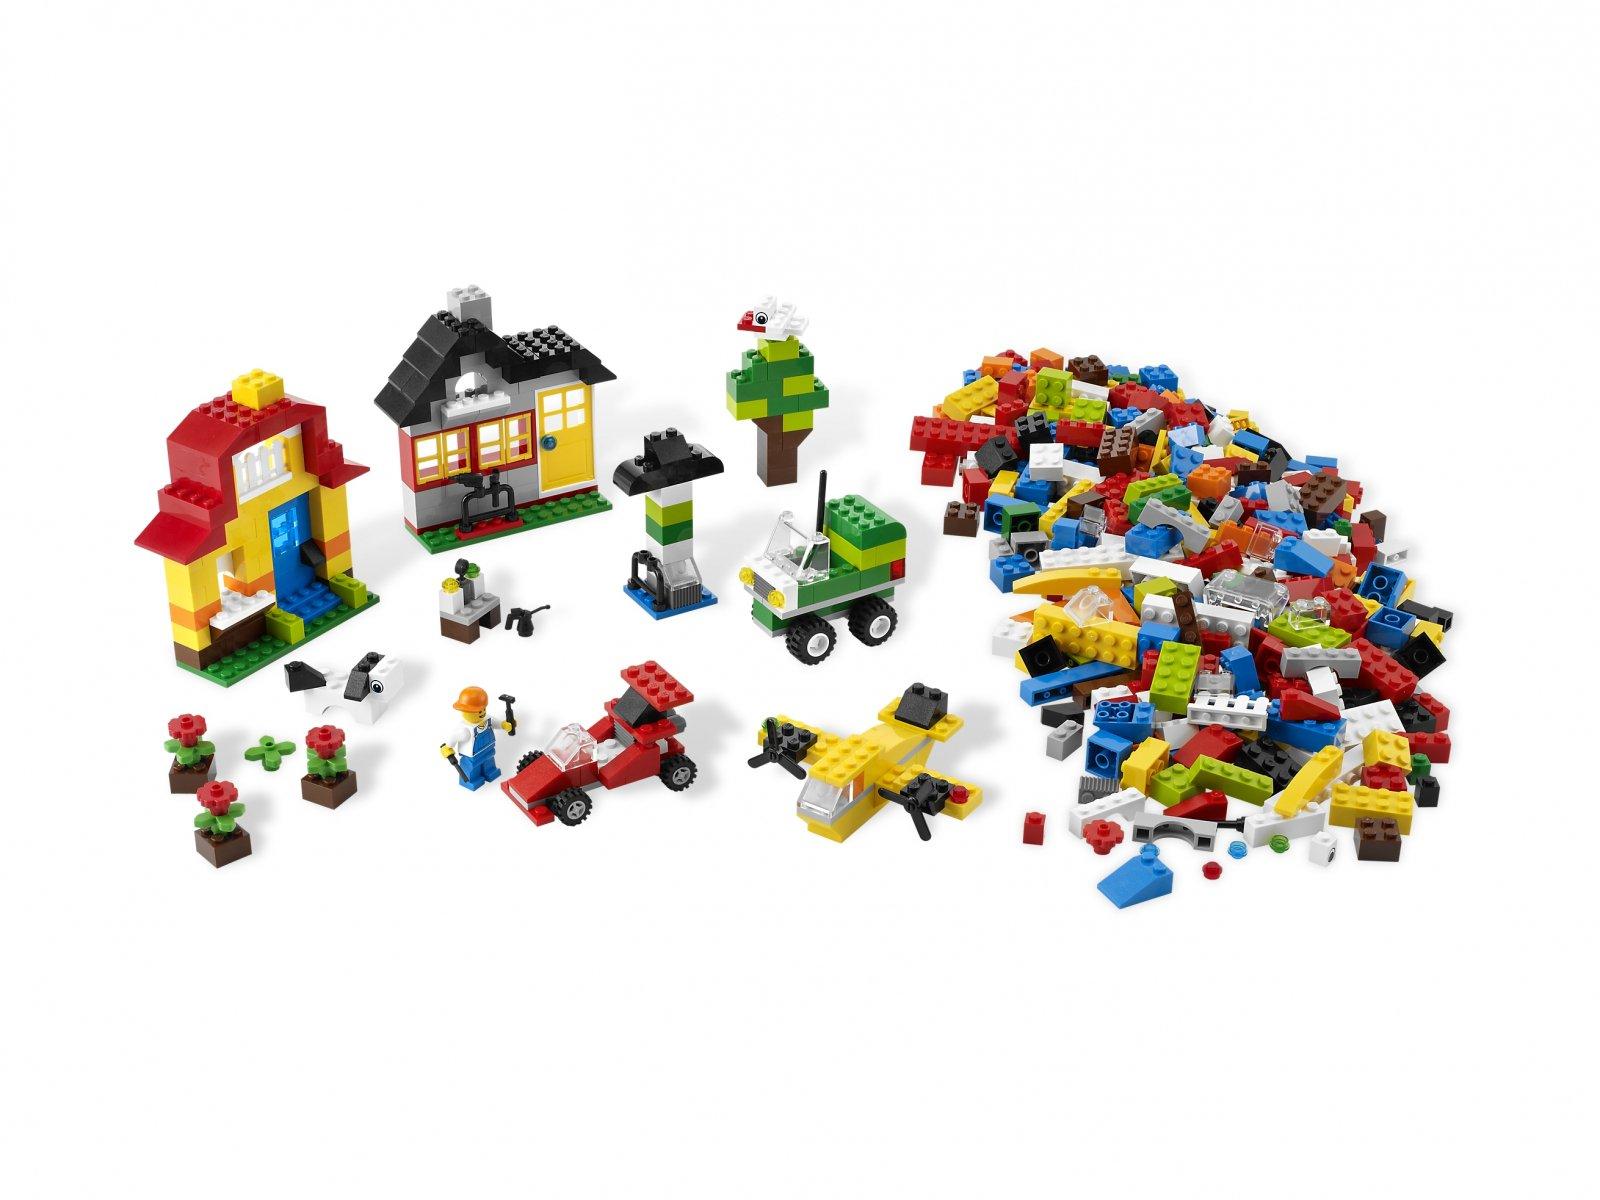 LEGO 6131 Bricks & More Build & Play | zklocków.pl